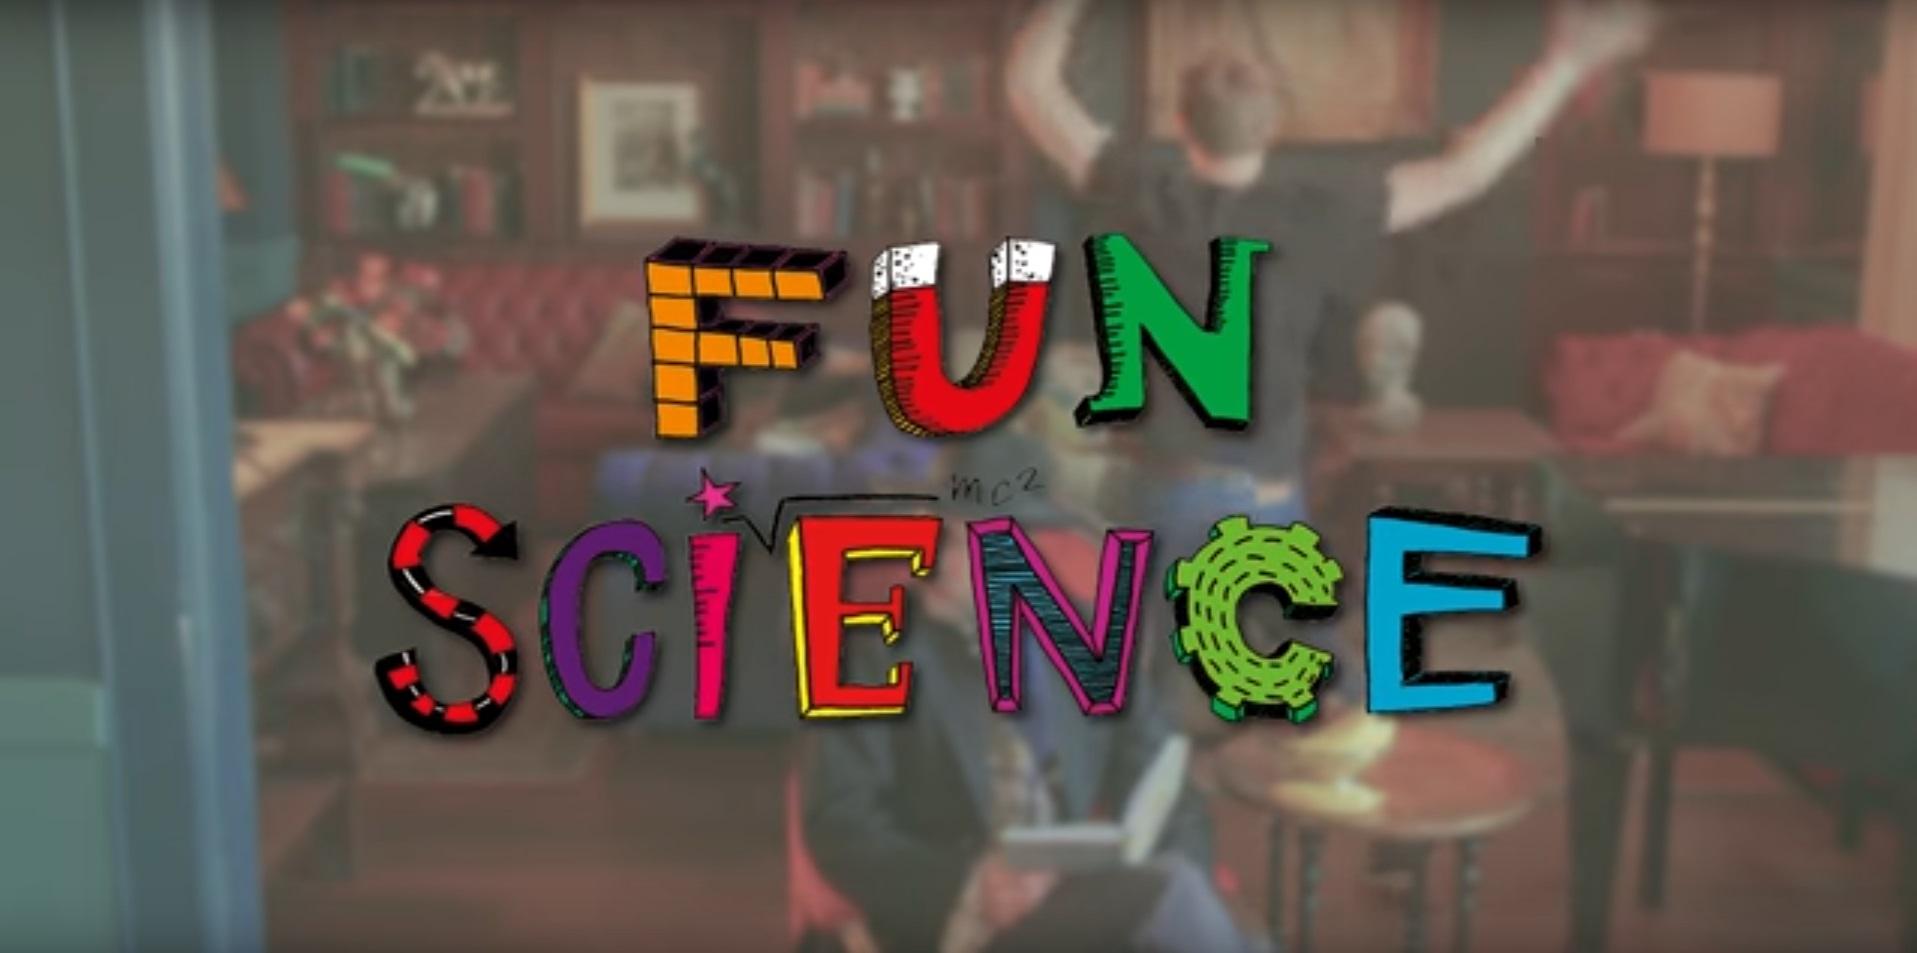 funsciencebook2